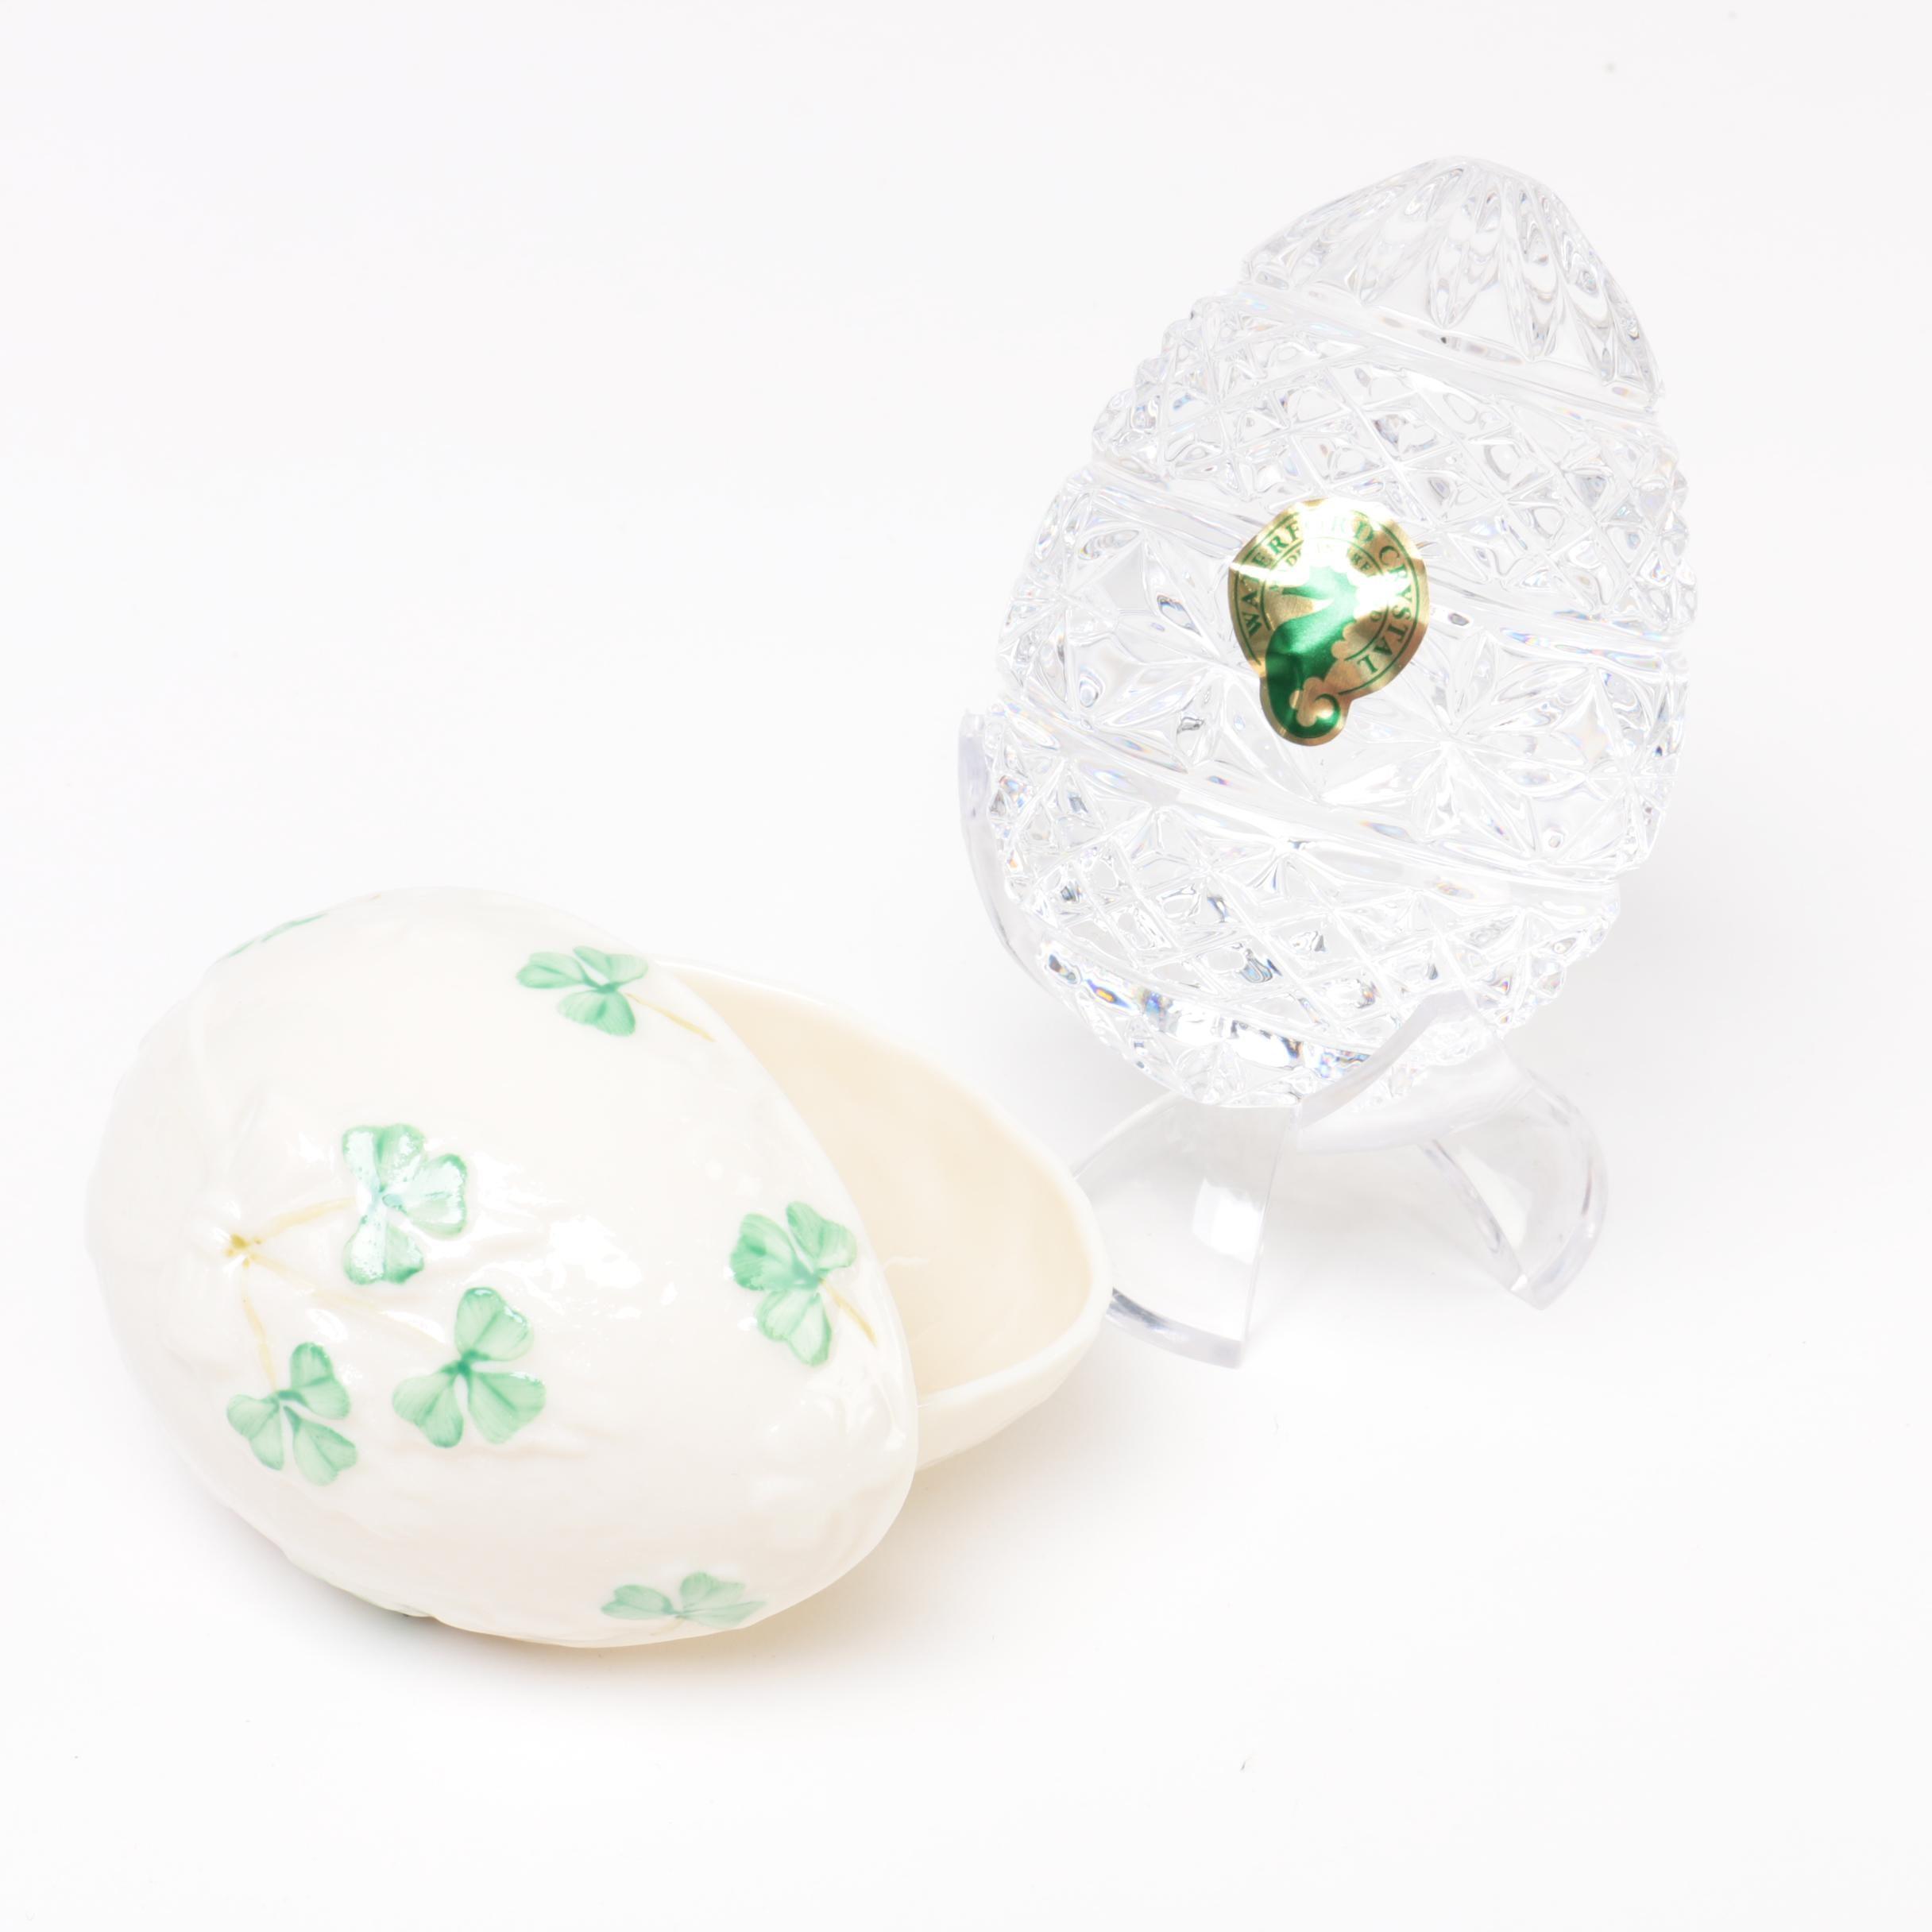 Waterford Crystal Egg with Belleek Porcelain Trinket Box